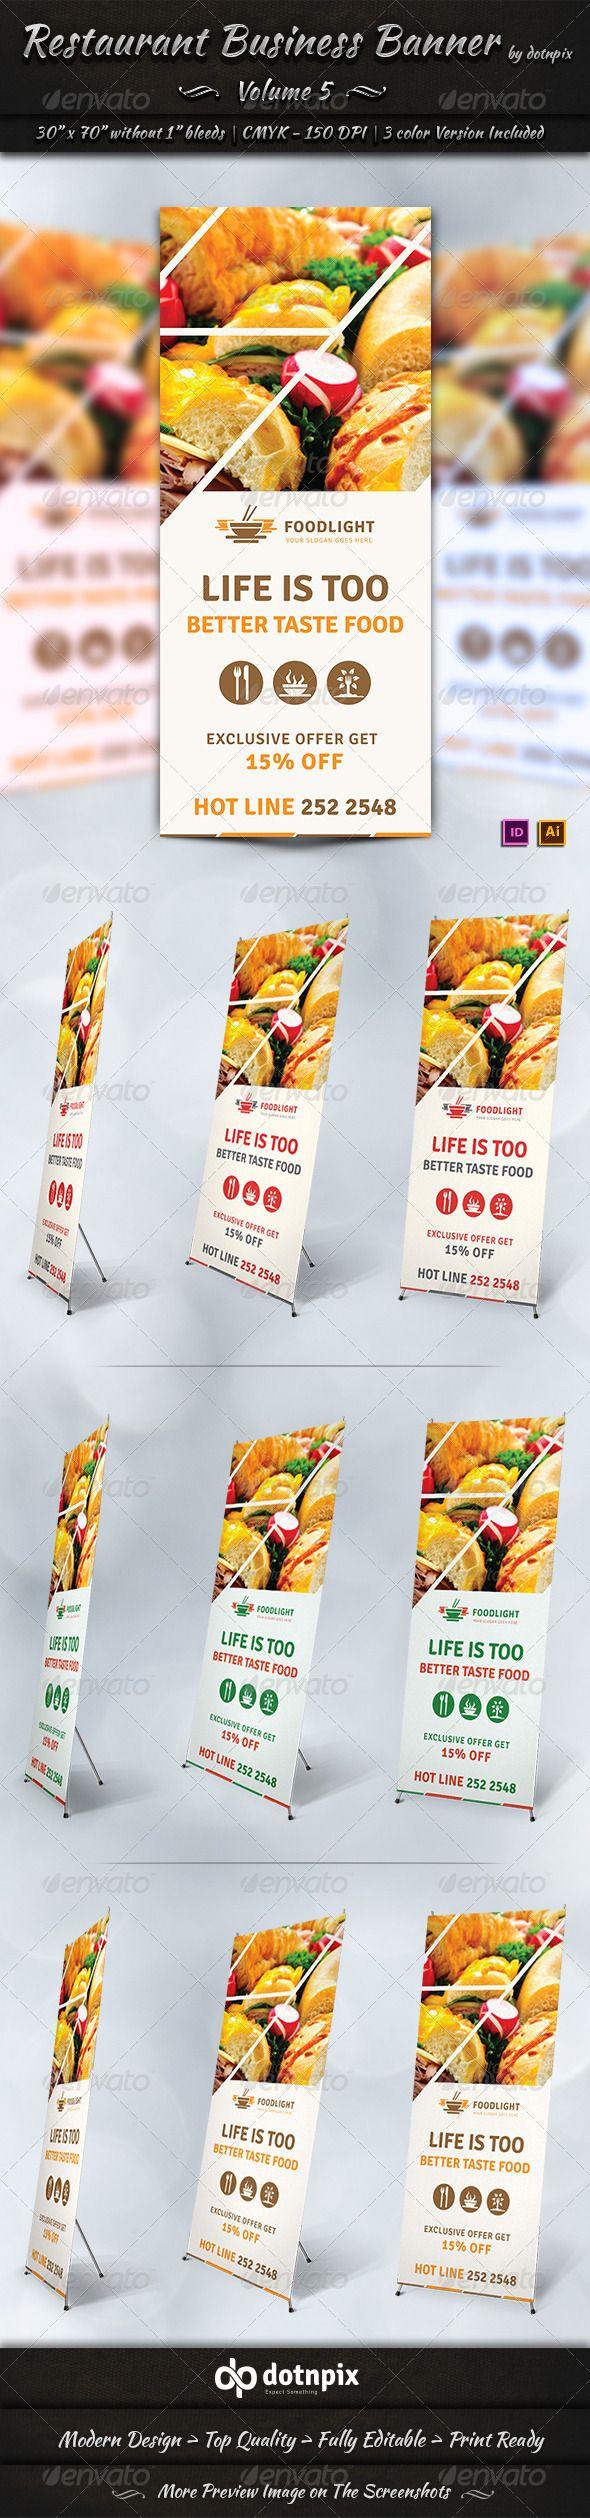 Design banner wisuda - Restaurant Business Banner Volume 5